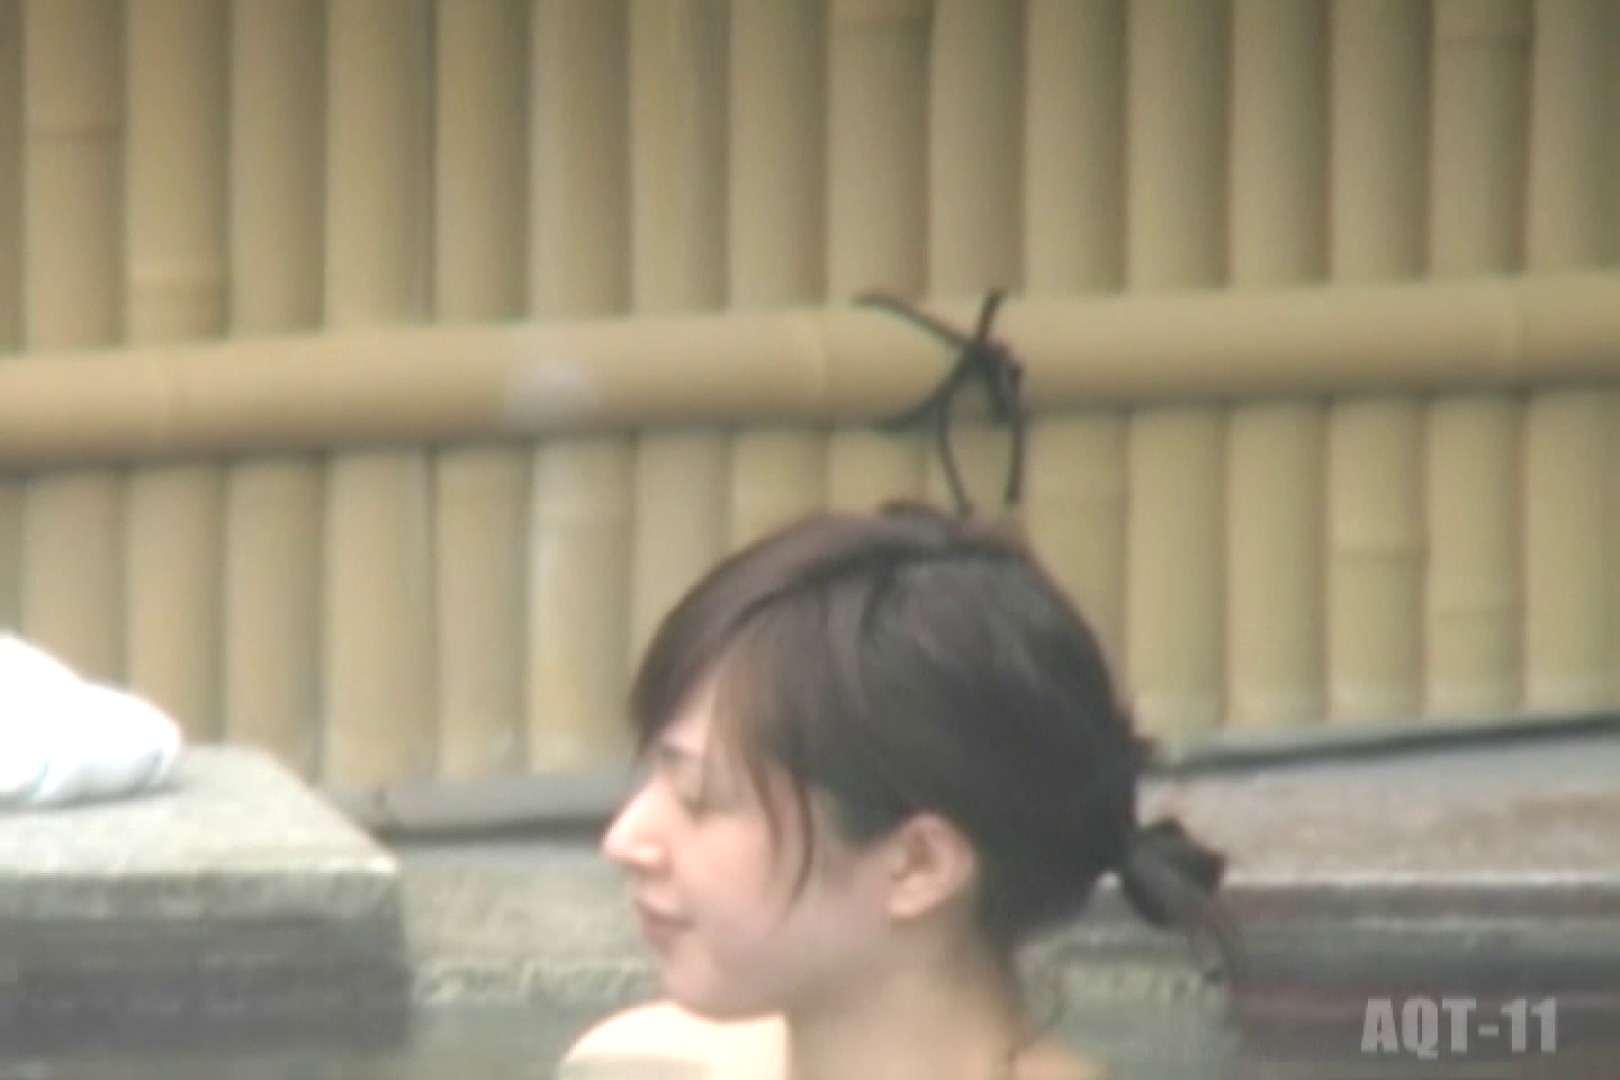 Aquaな露天風呂Vol.798 HなOL AV無料動画キャプチャ 109pic 72